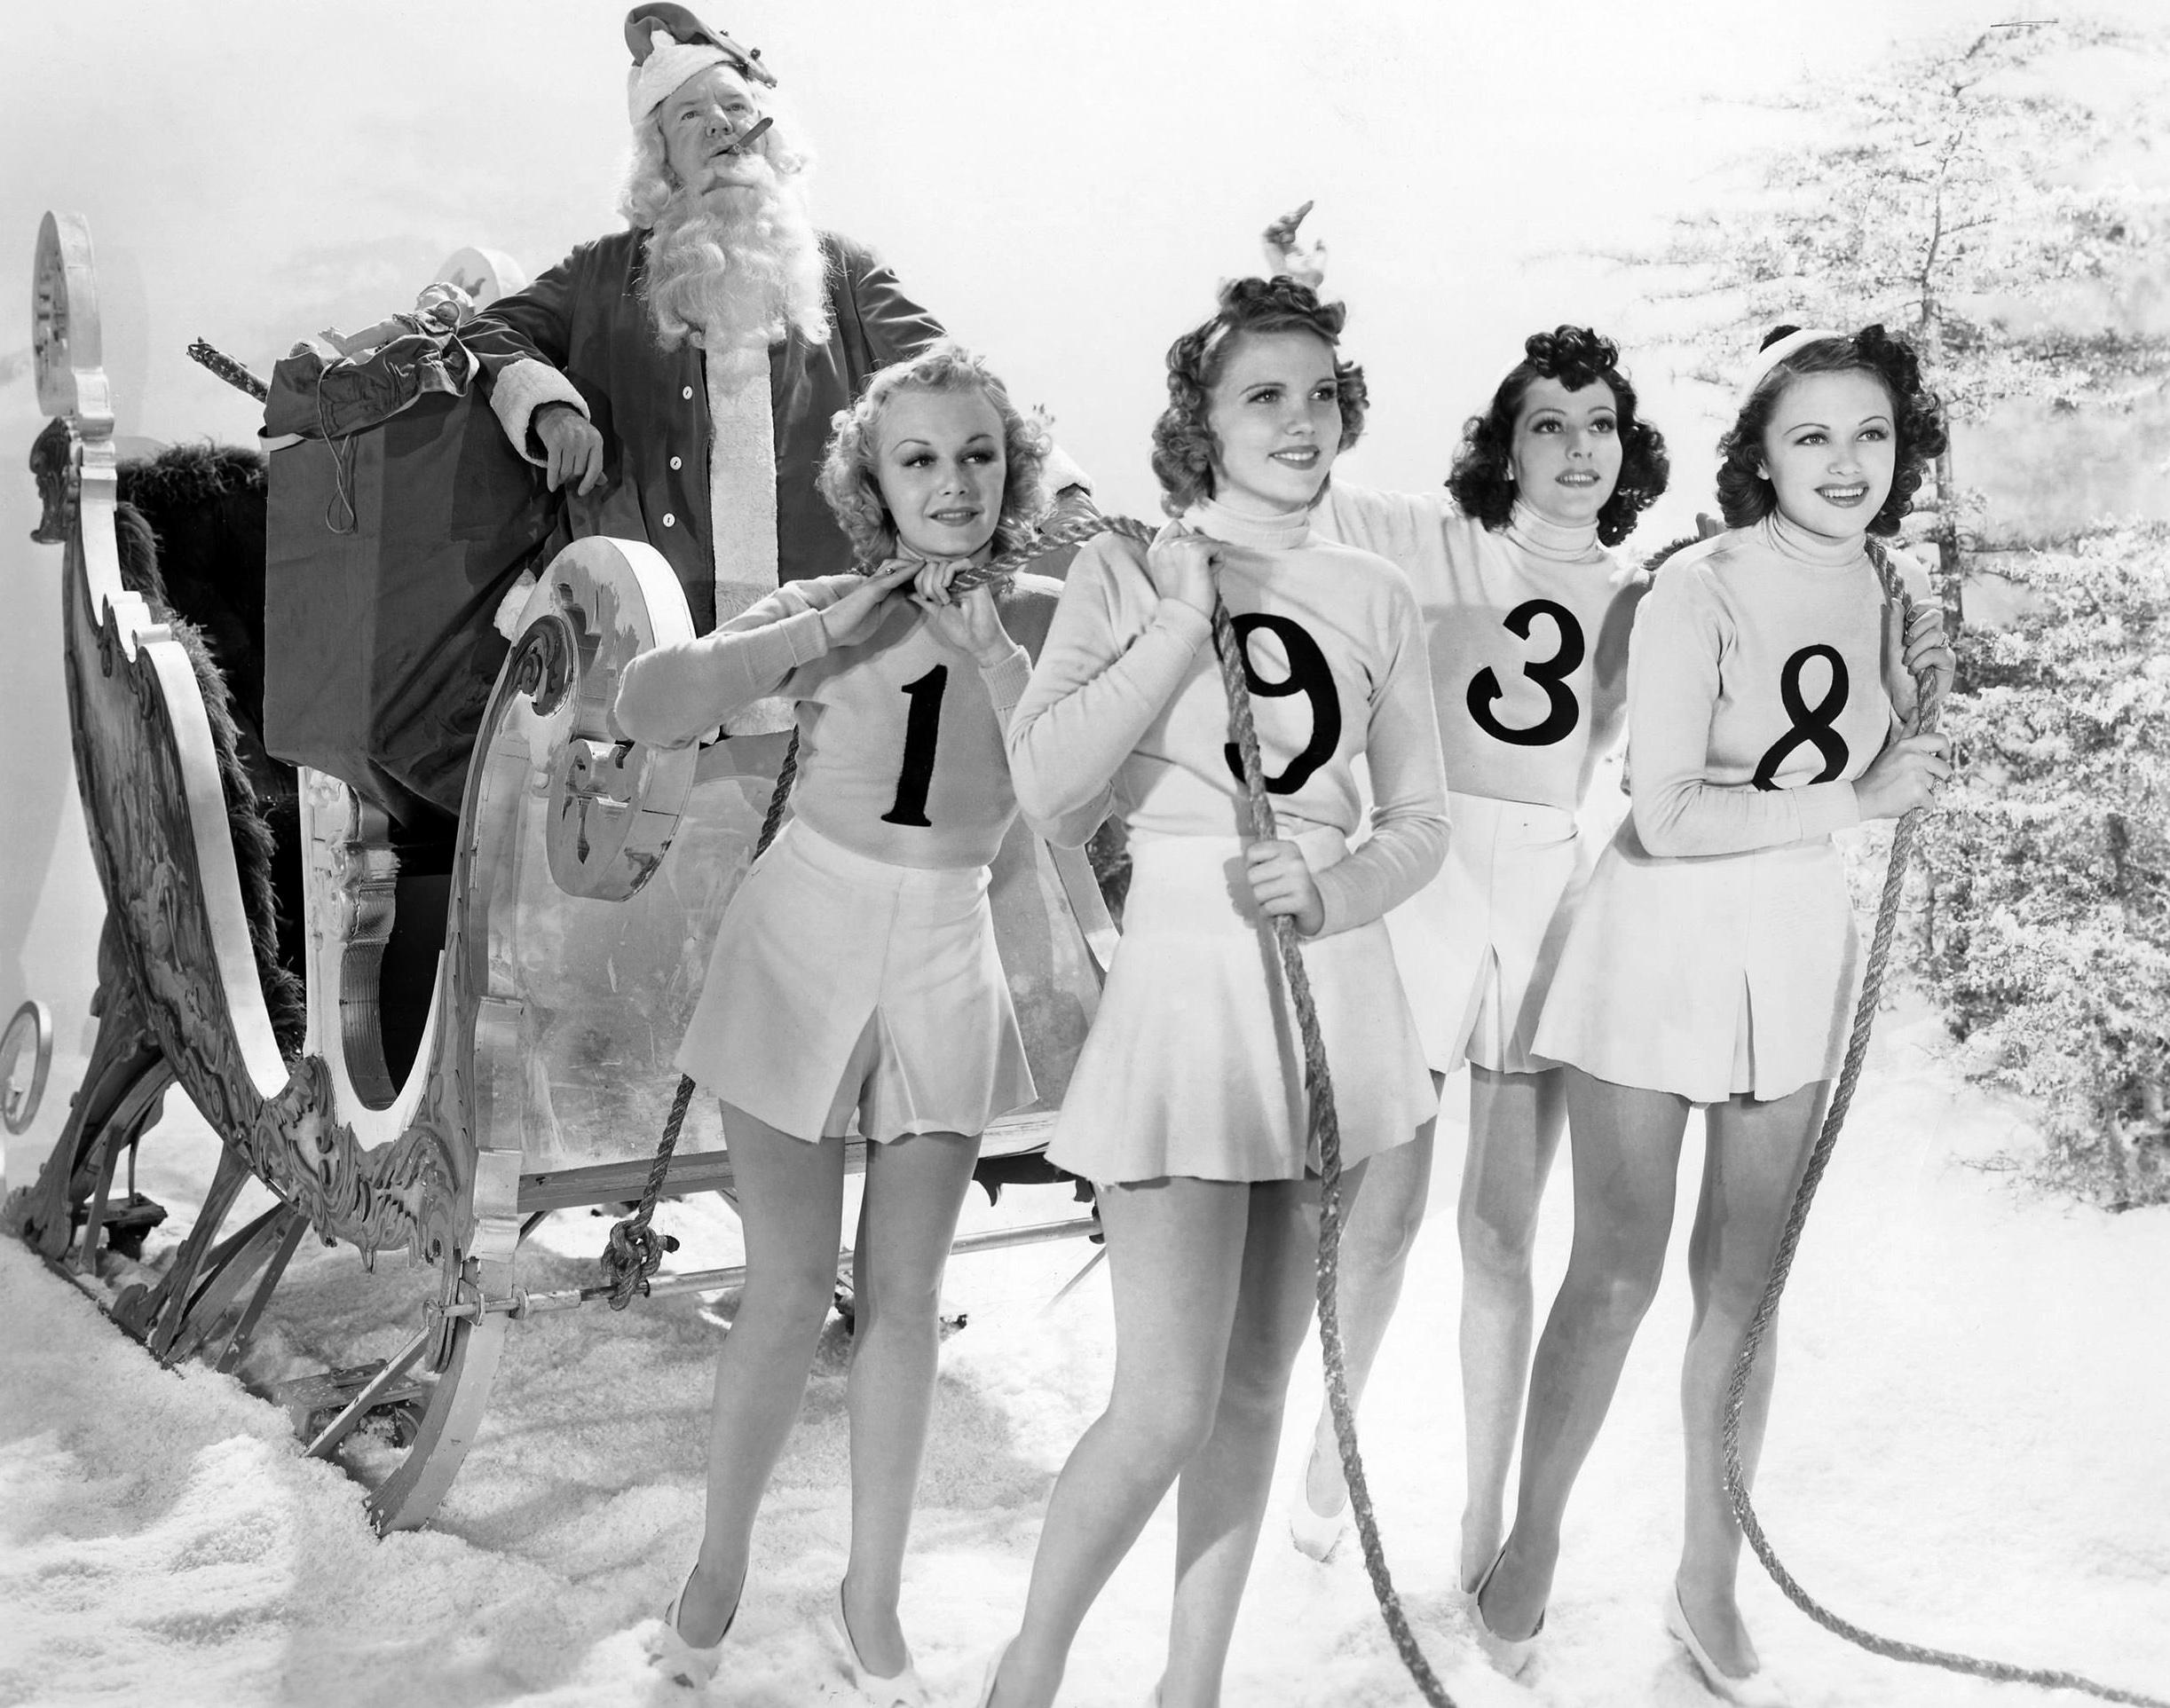 W.C. Fields, Marie Burton, Eleanor Counts, Eleanor Keaton, and Gwen Kenyon in The Big Broadcast of 1938 (1938)